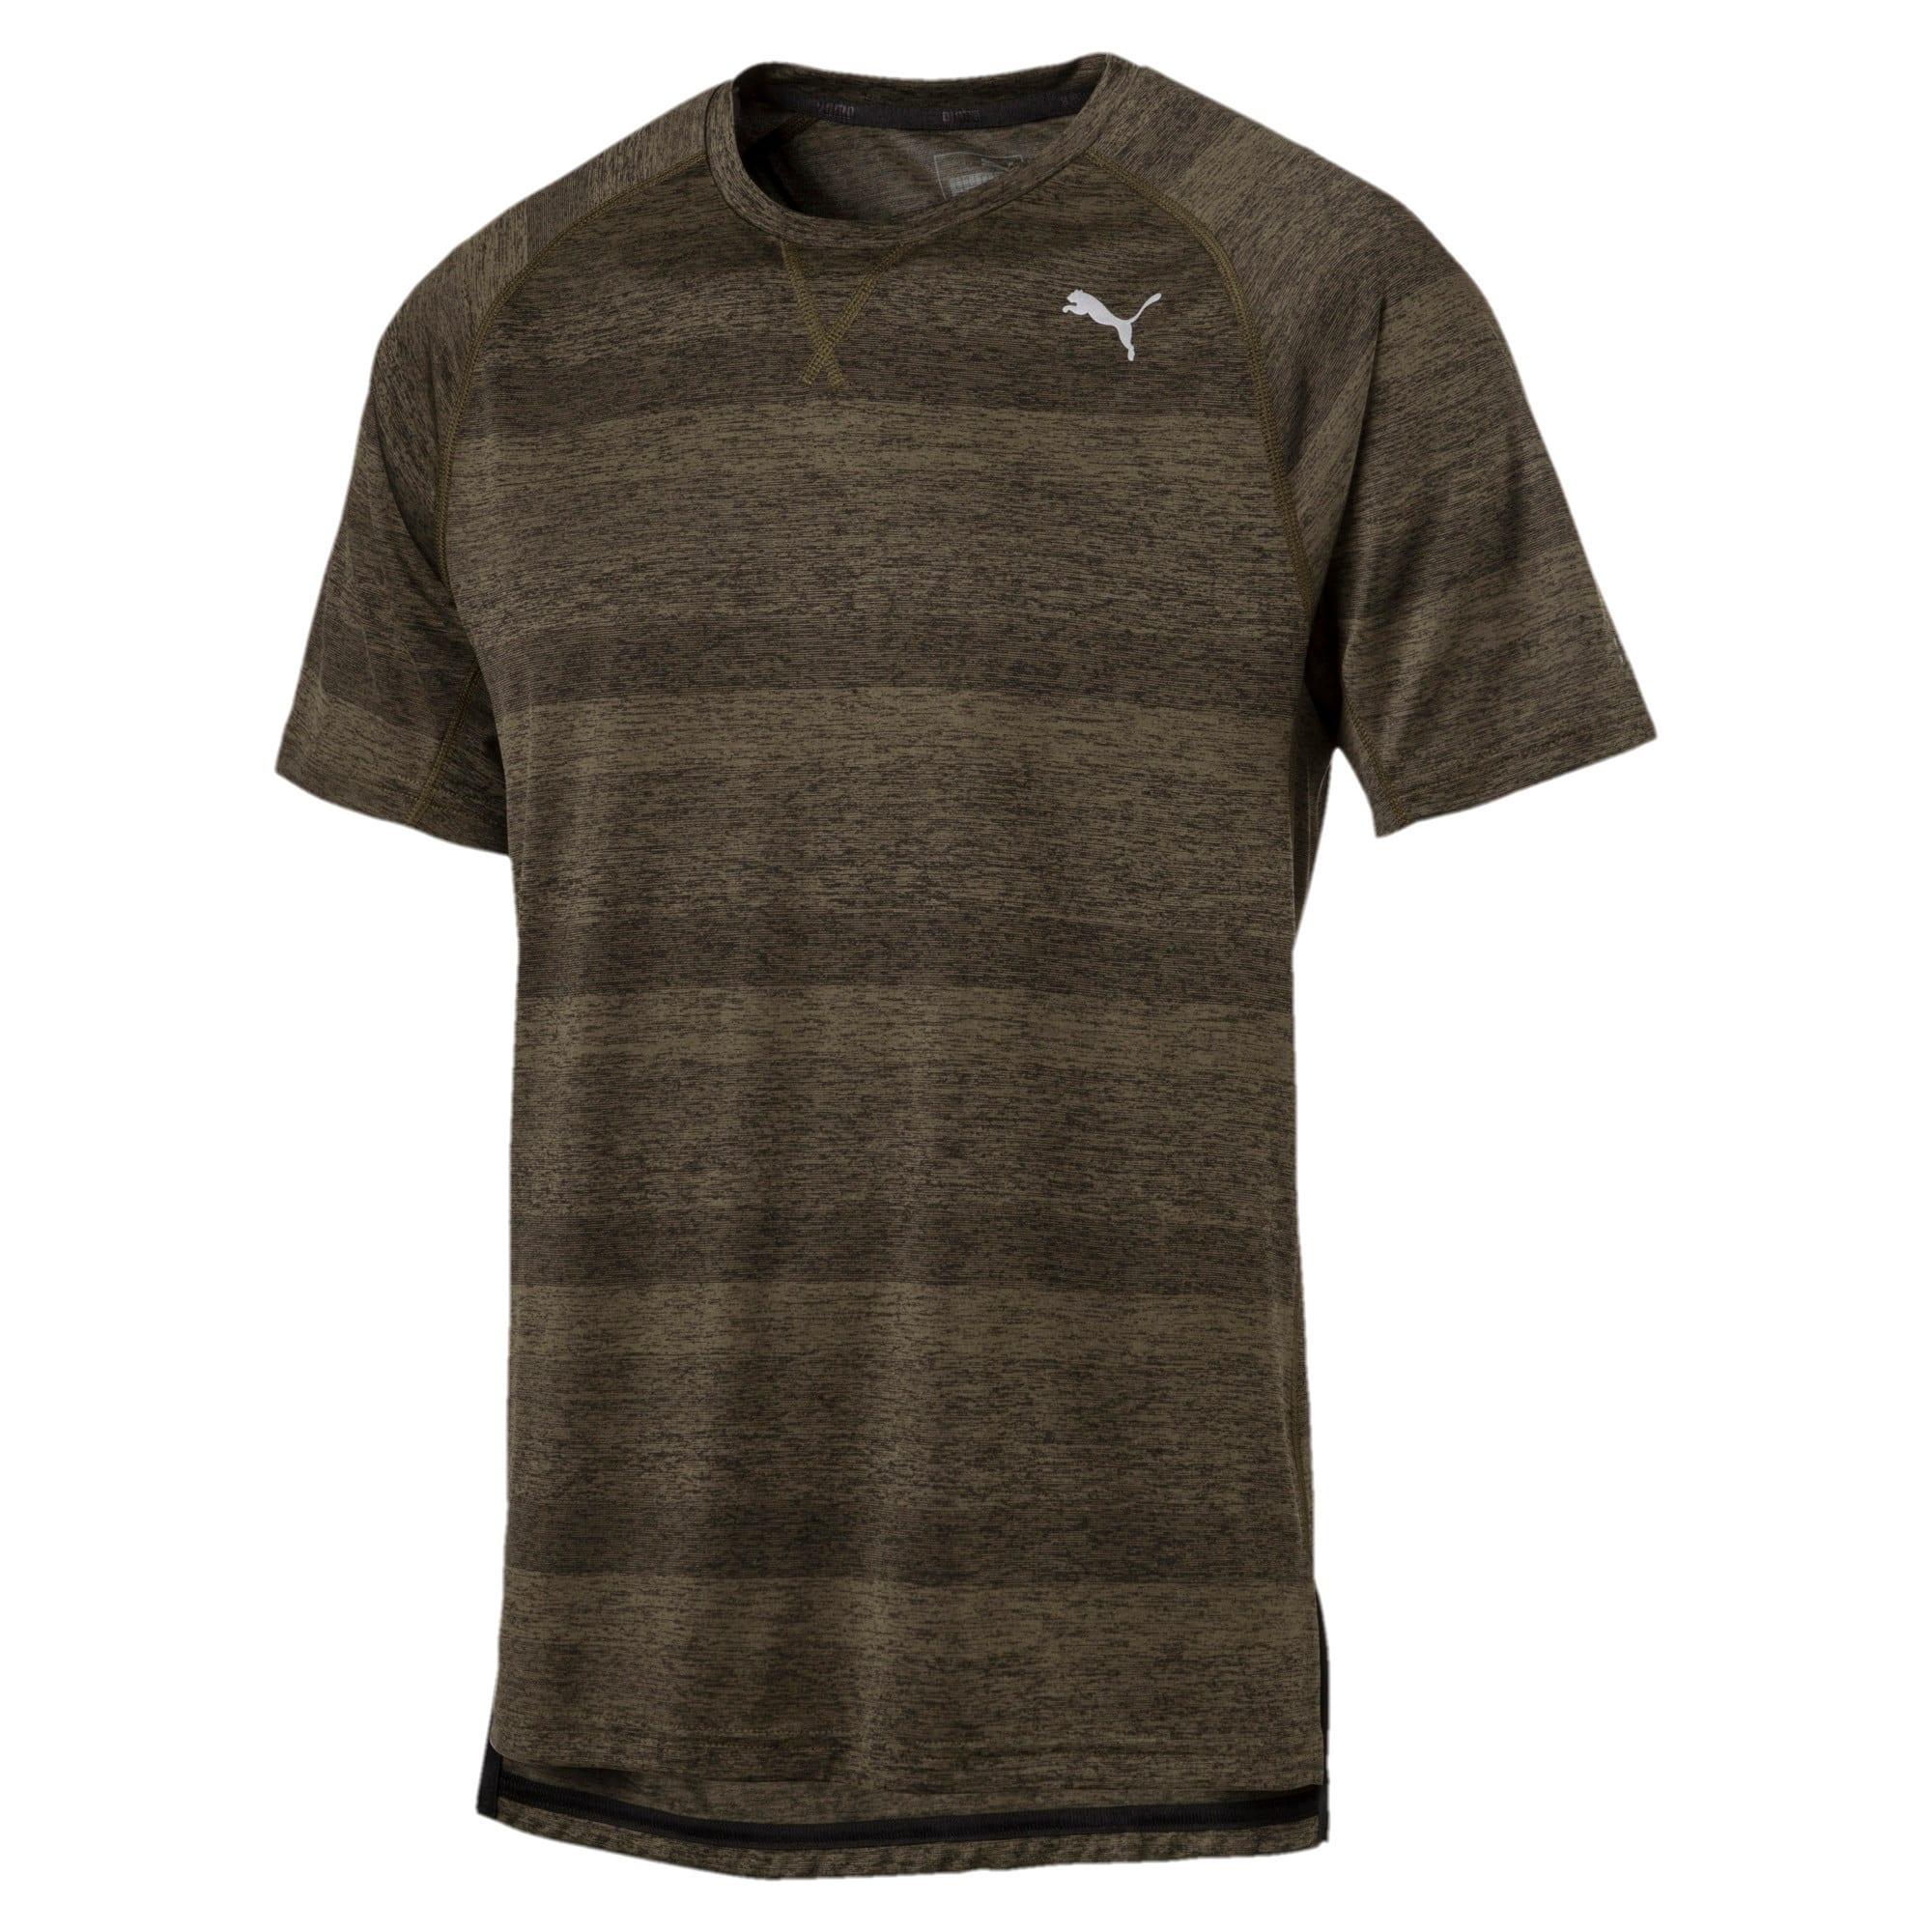 Thumbnail 4 of Running Men's Energy T-Shirt, Olive Night Heather, medium-IND